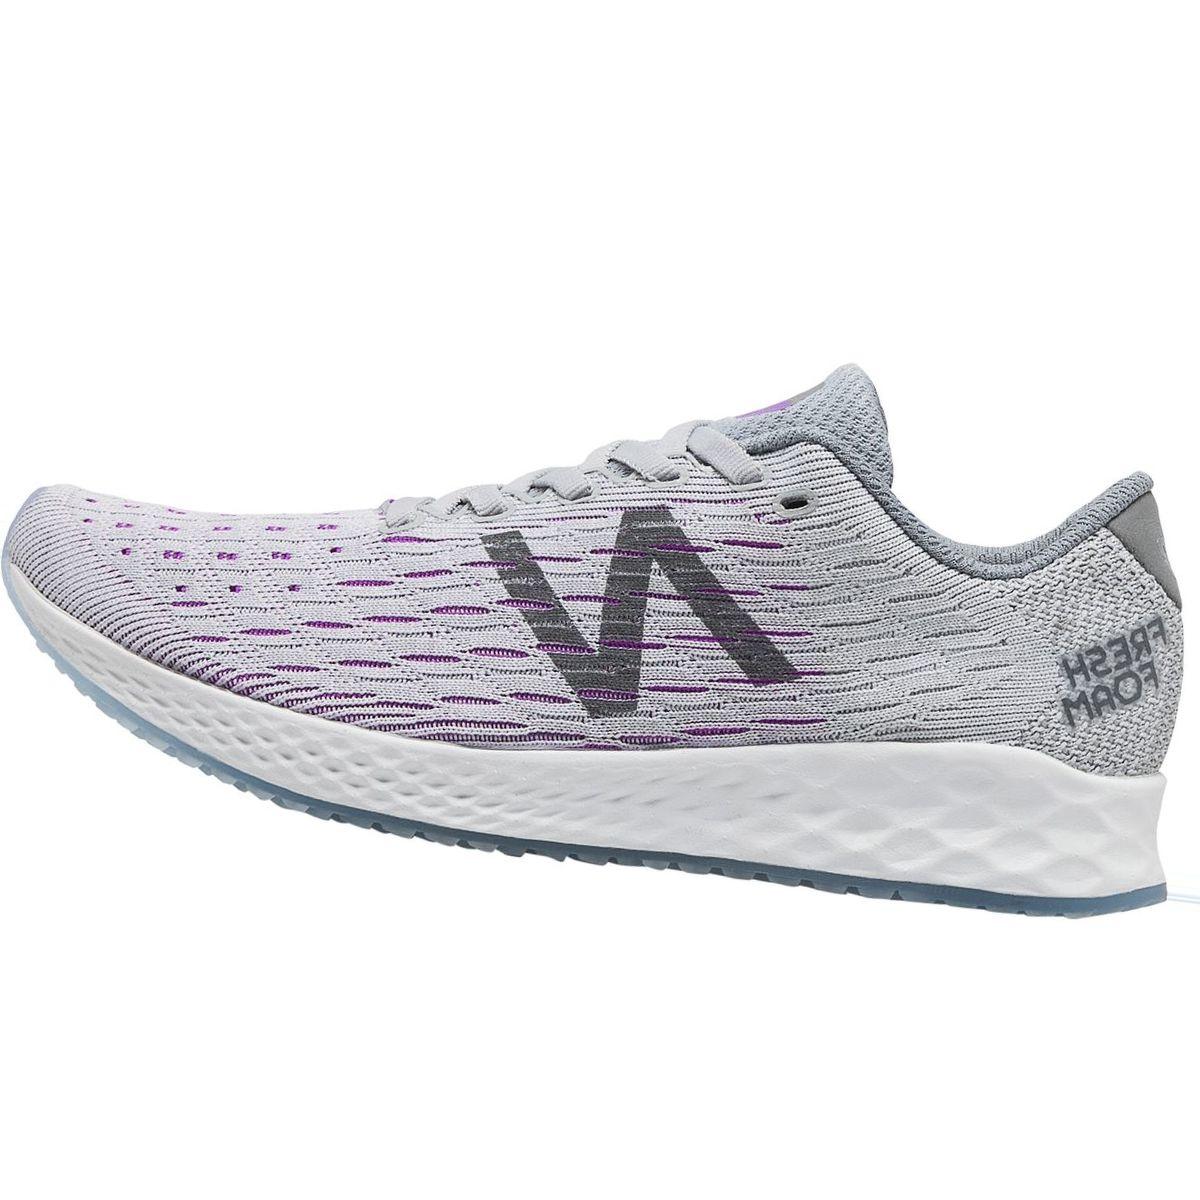 New Balance Fresh Foam Zante Pursuit Running Shoe - Women's